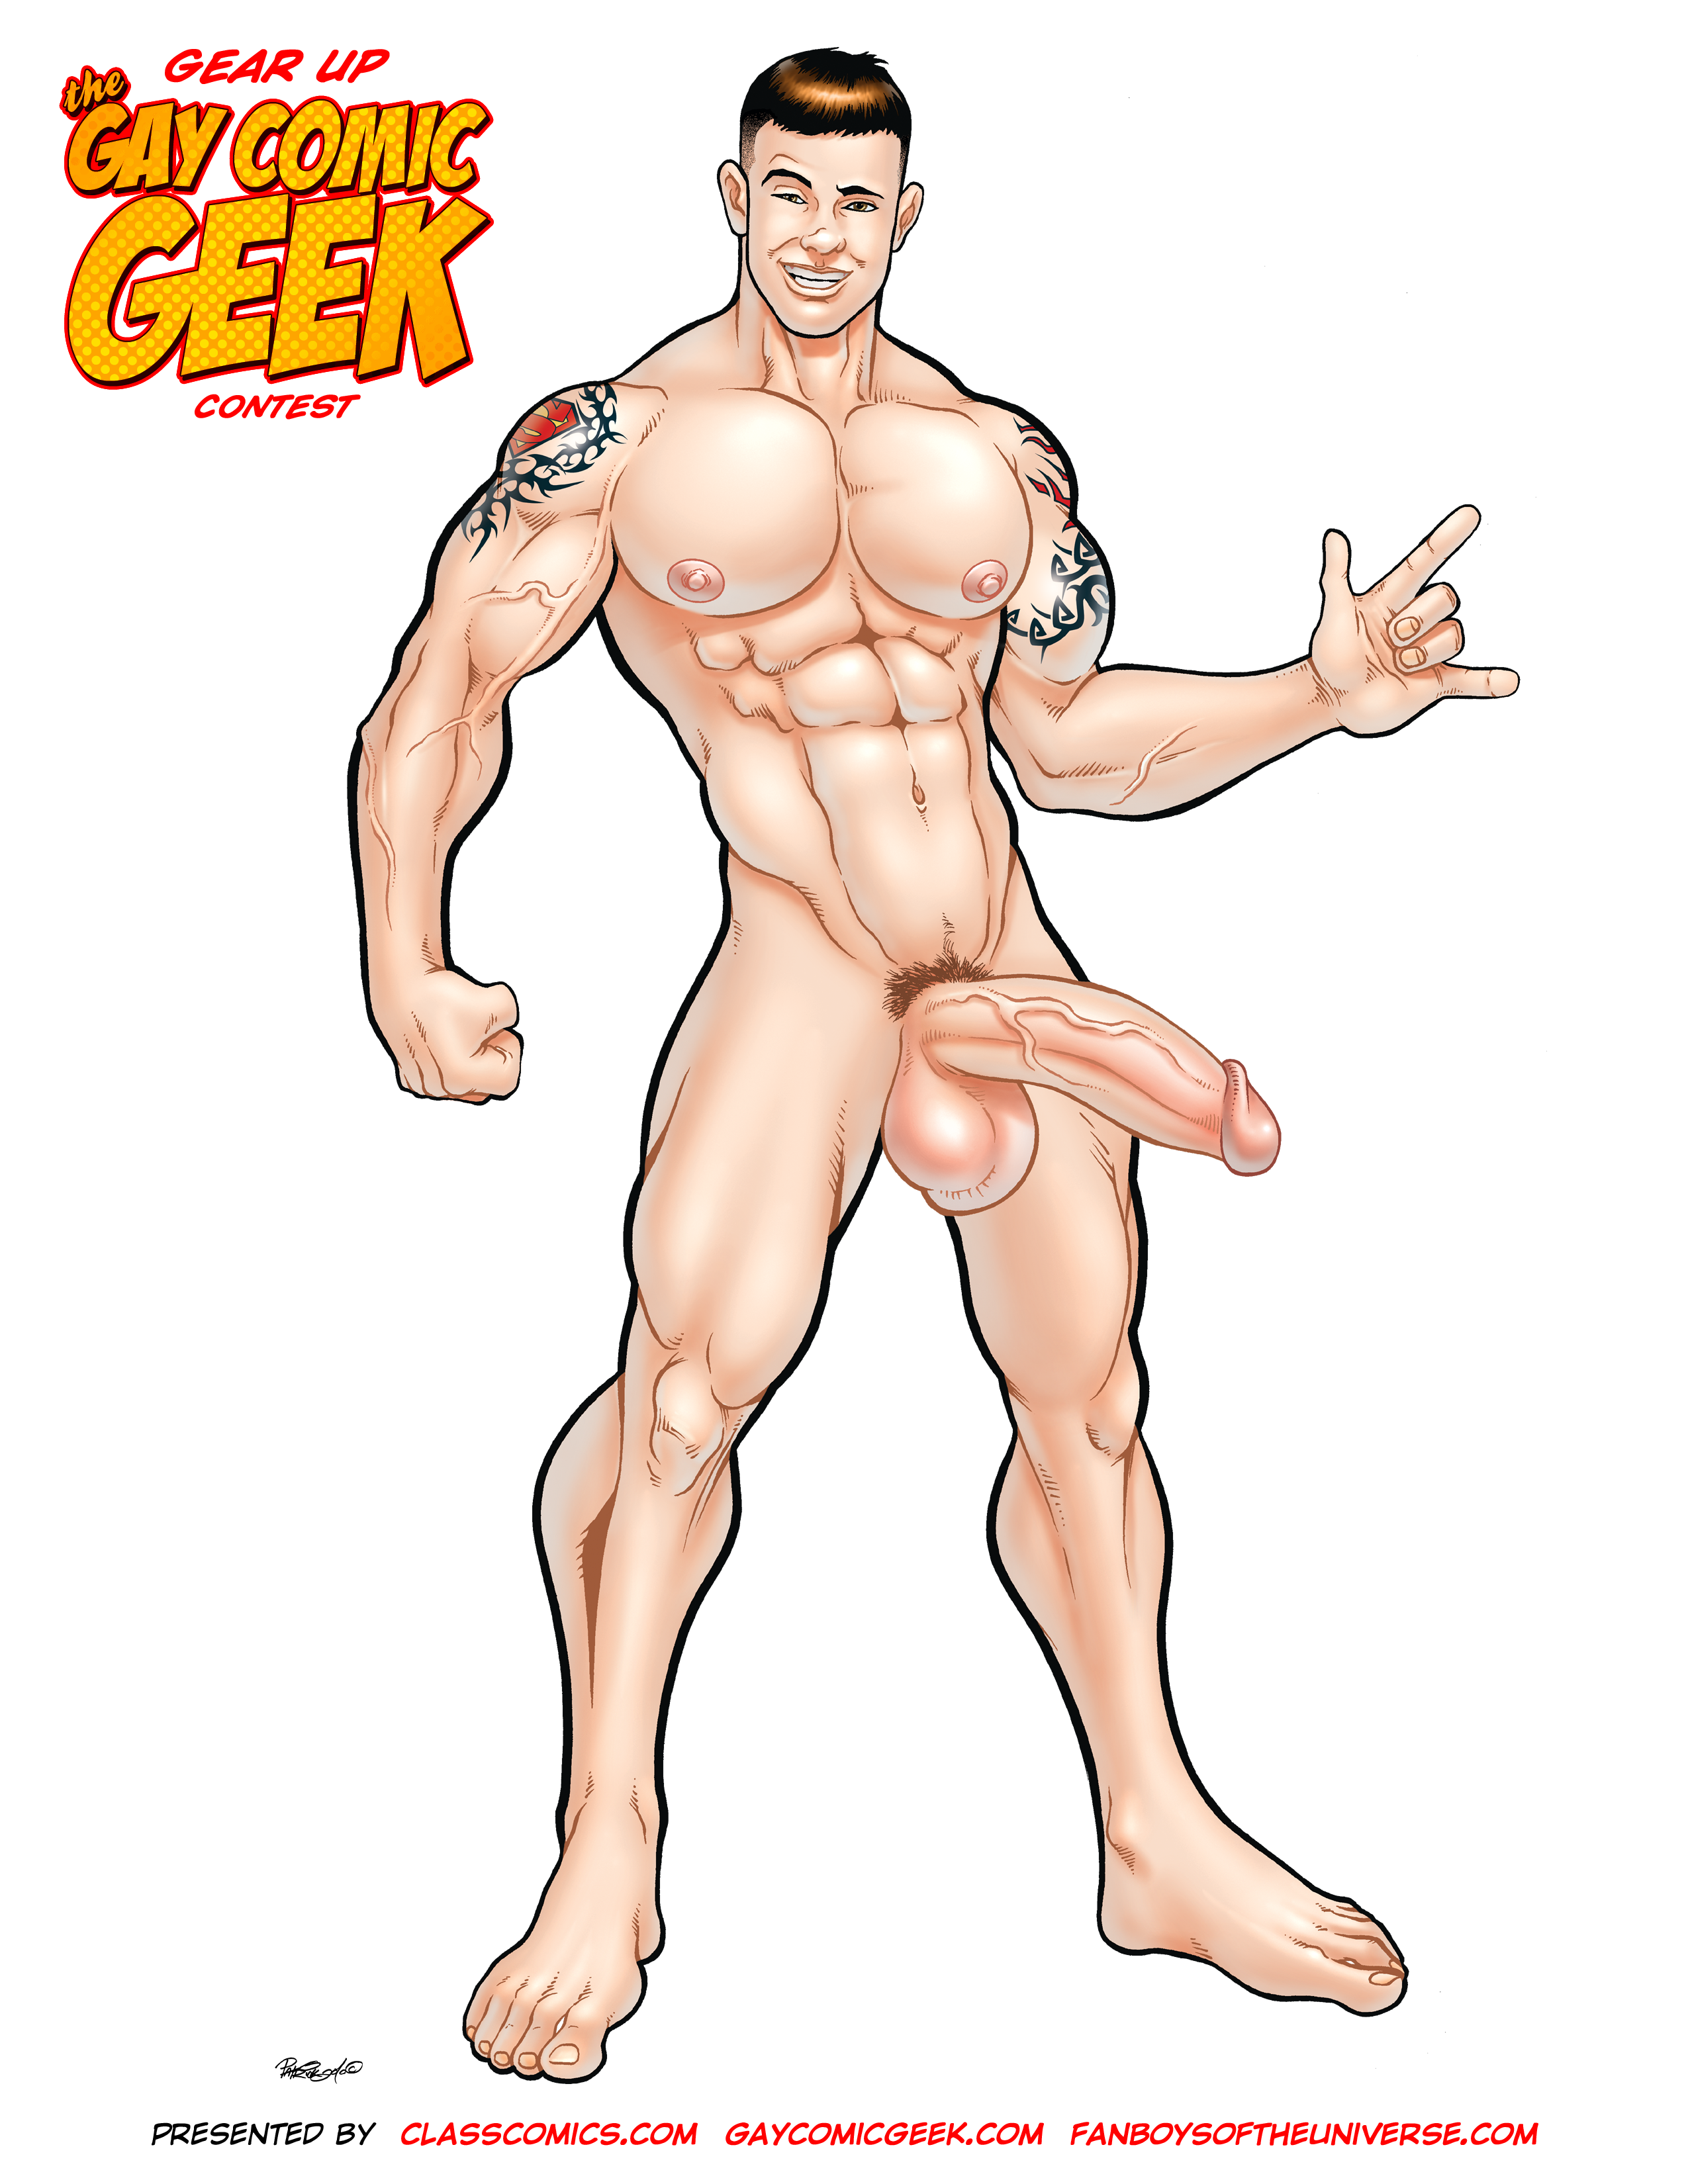 racconti erotivi gay Cesena